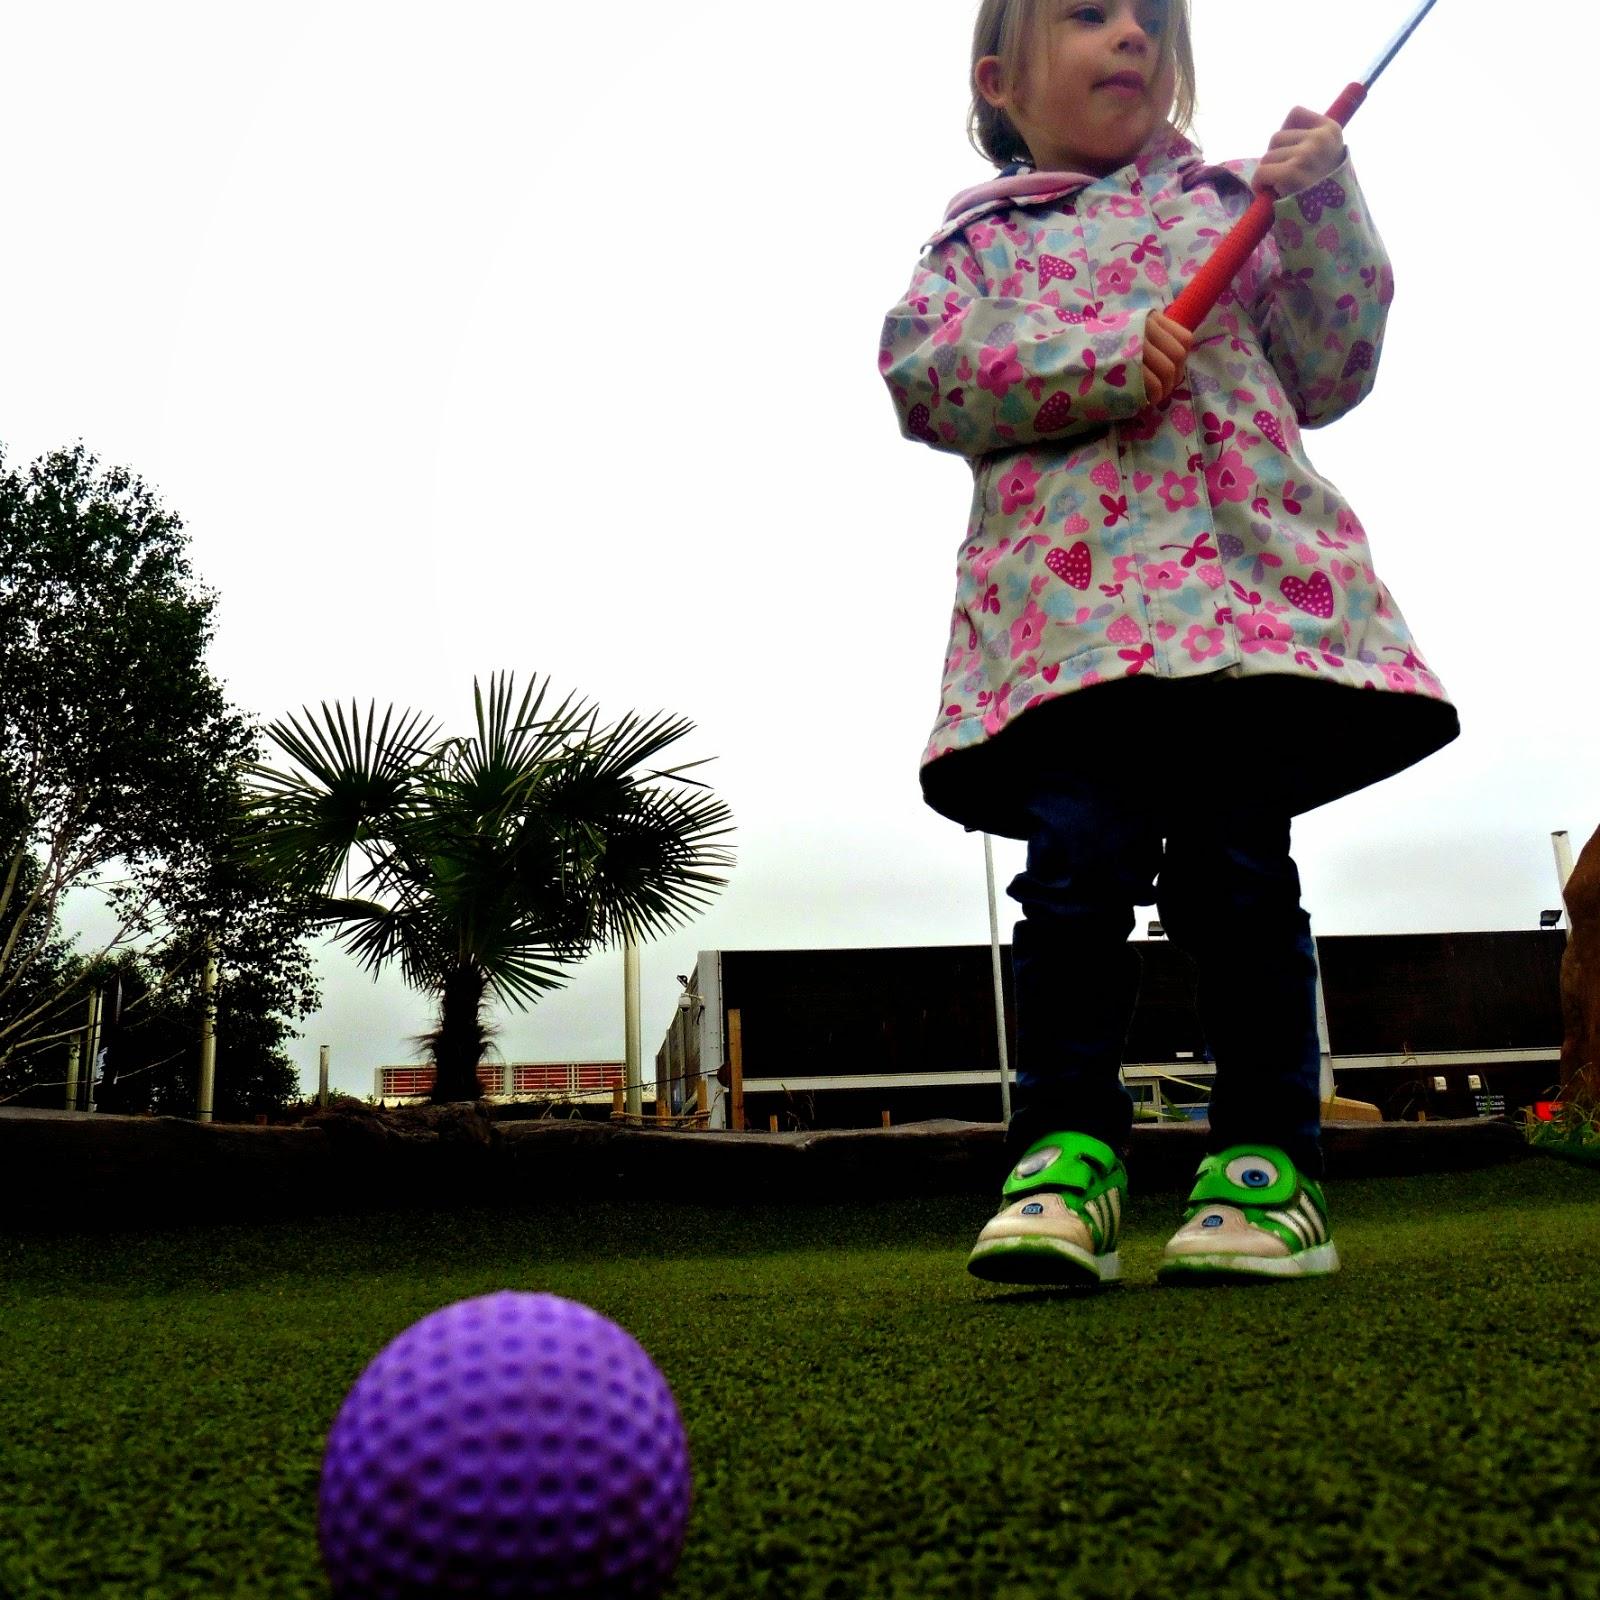 eldest playing golf